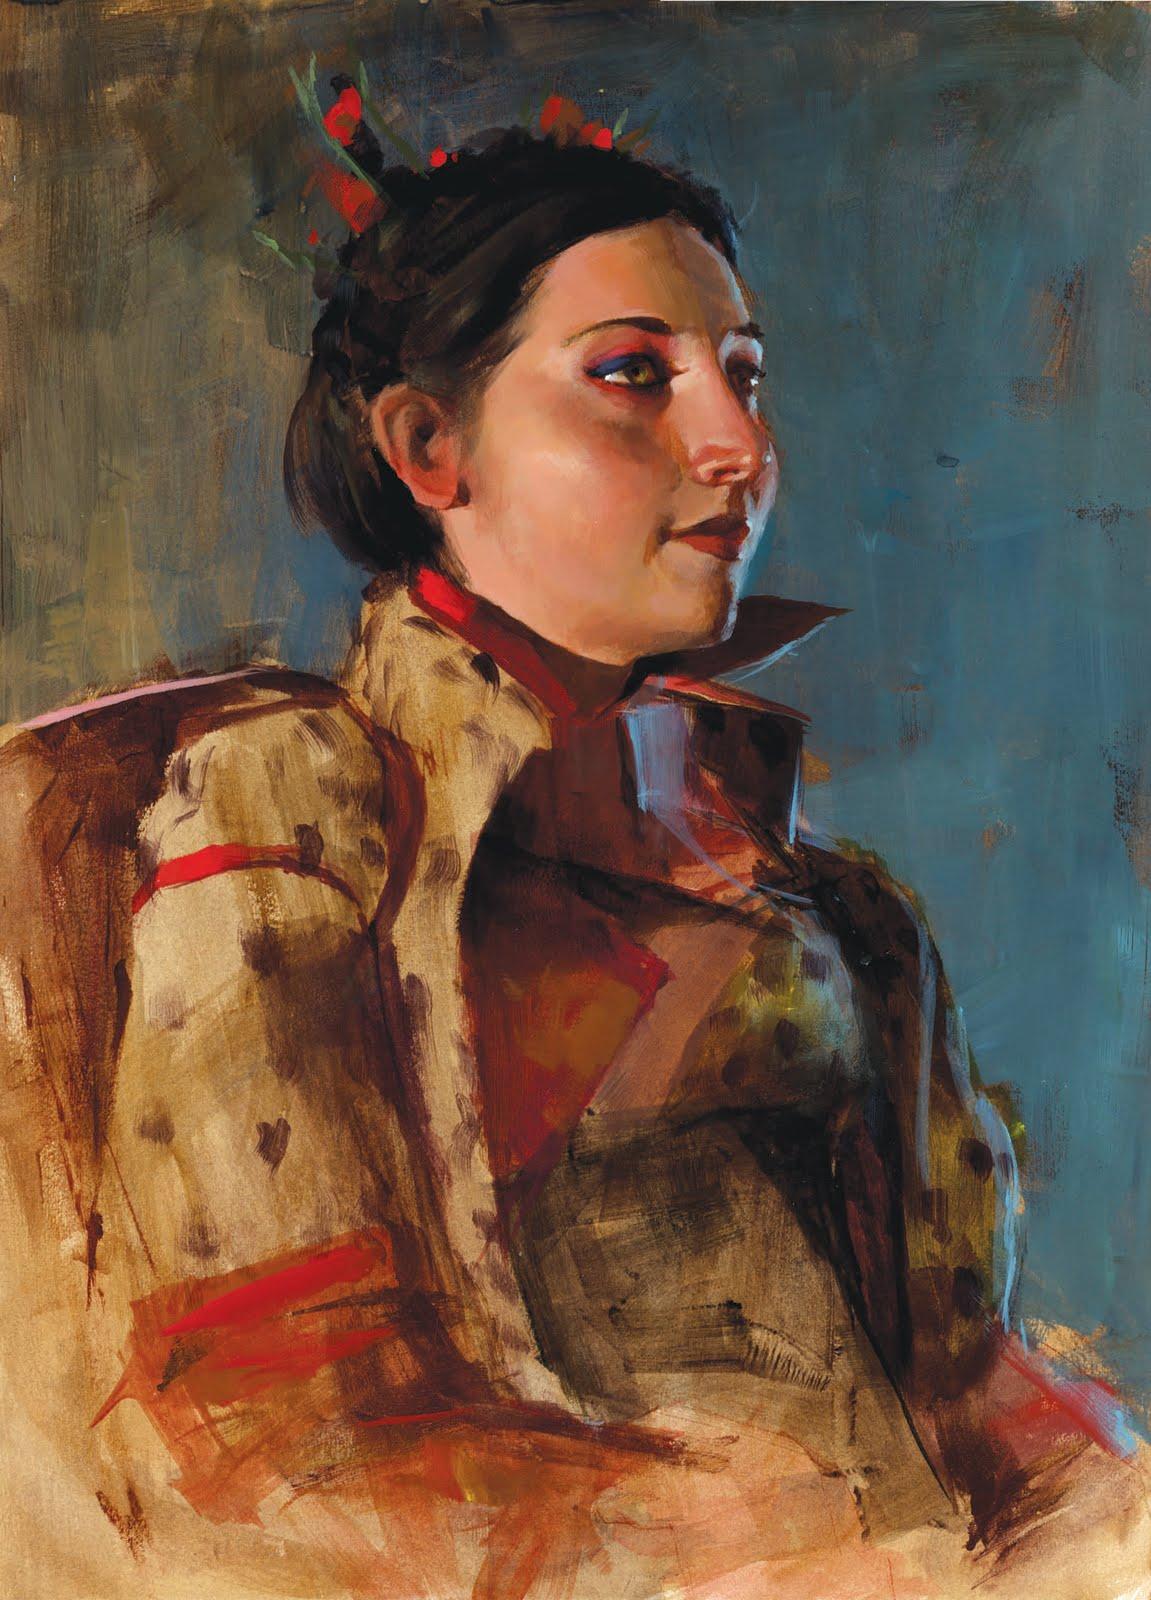 Sara Streeter